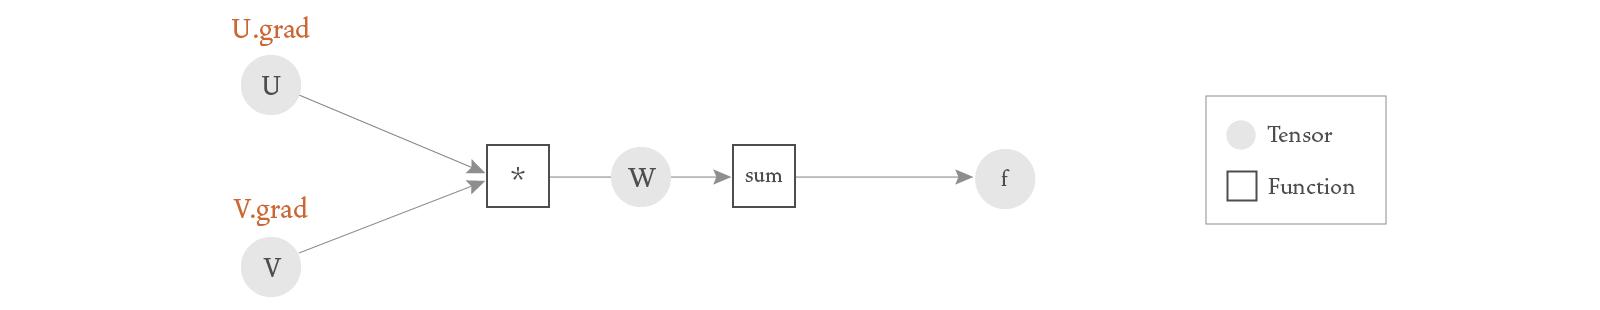 Tensor calculations represented as a DAG.